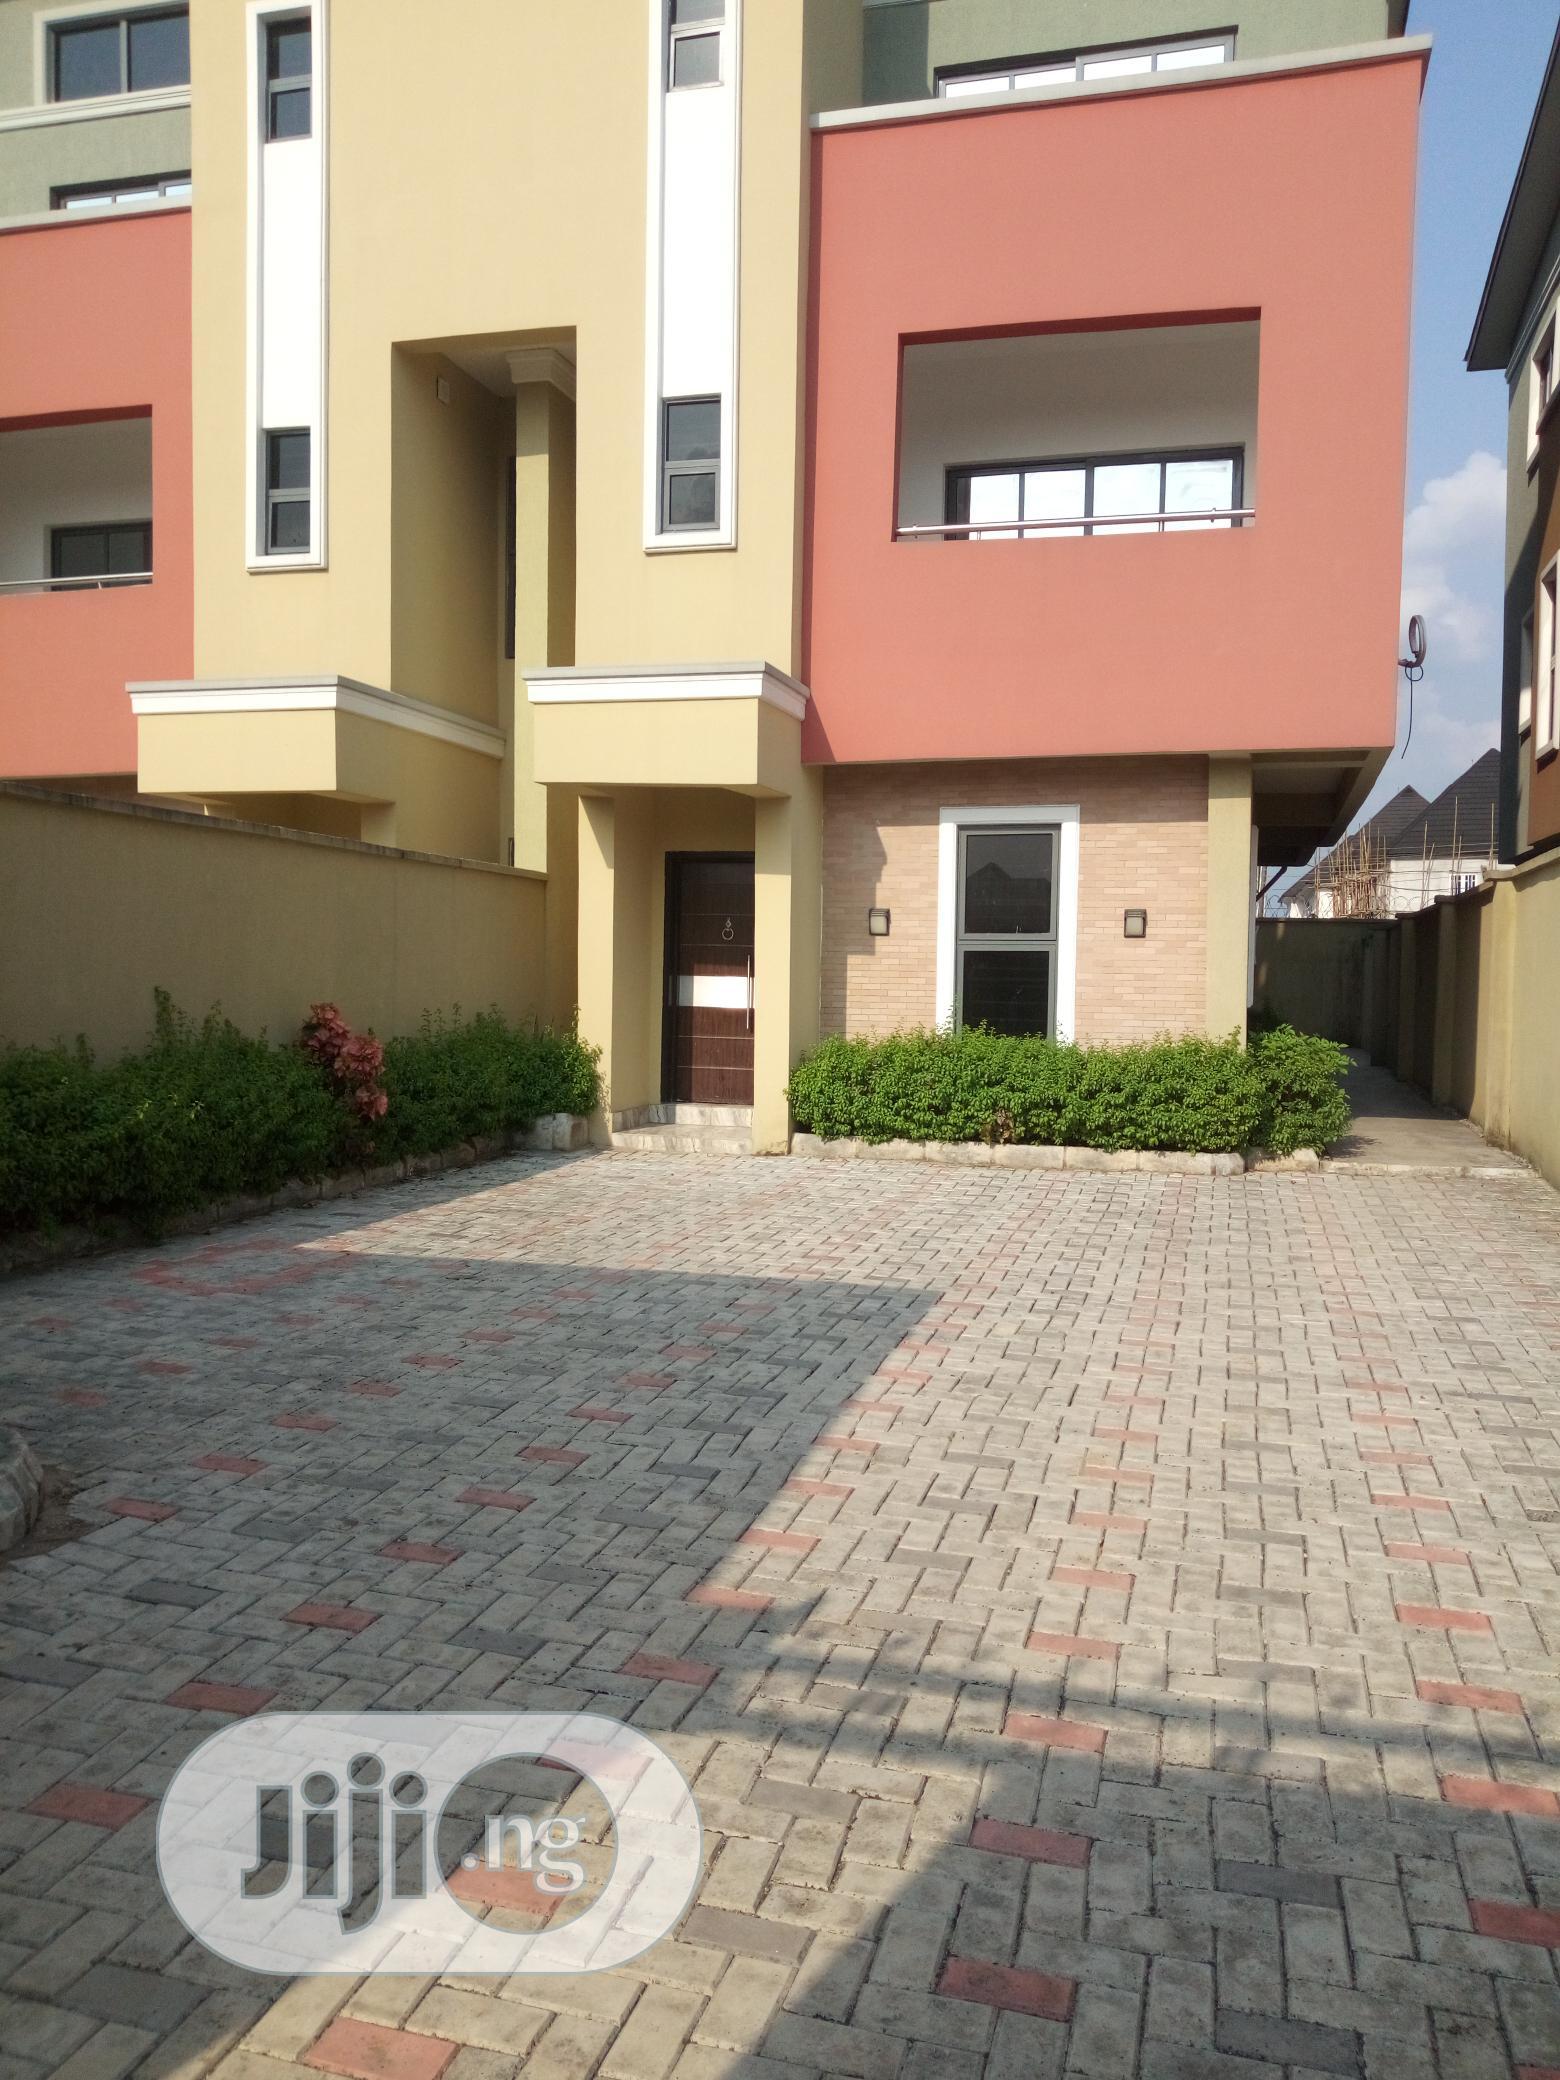 For Sale Brand New 4bedroom Duplex In Shell Co Operative Eliozu PH